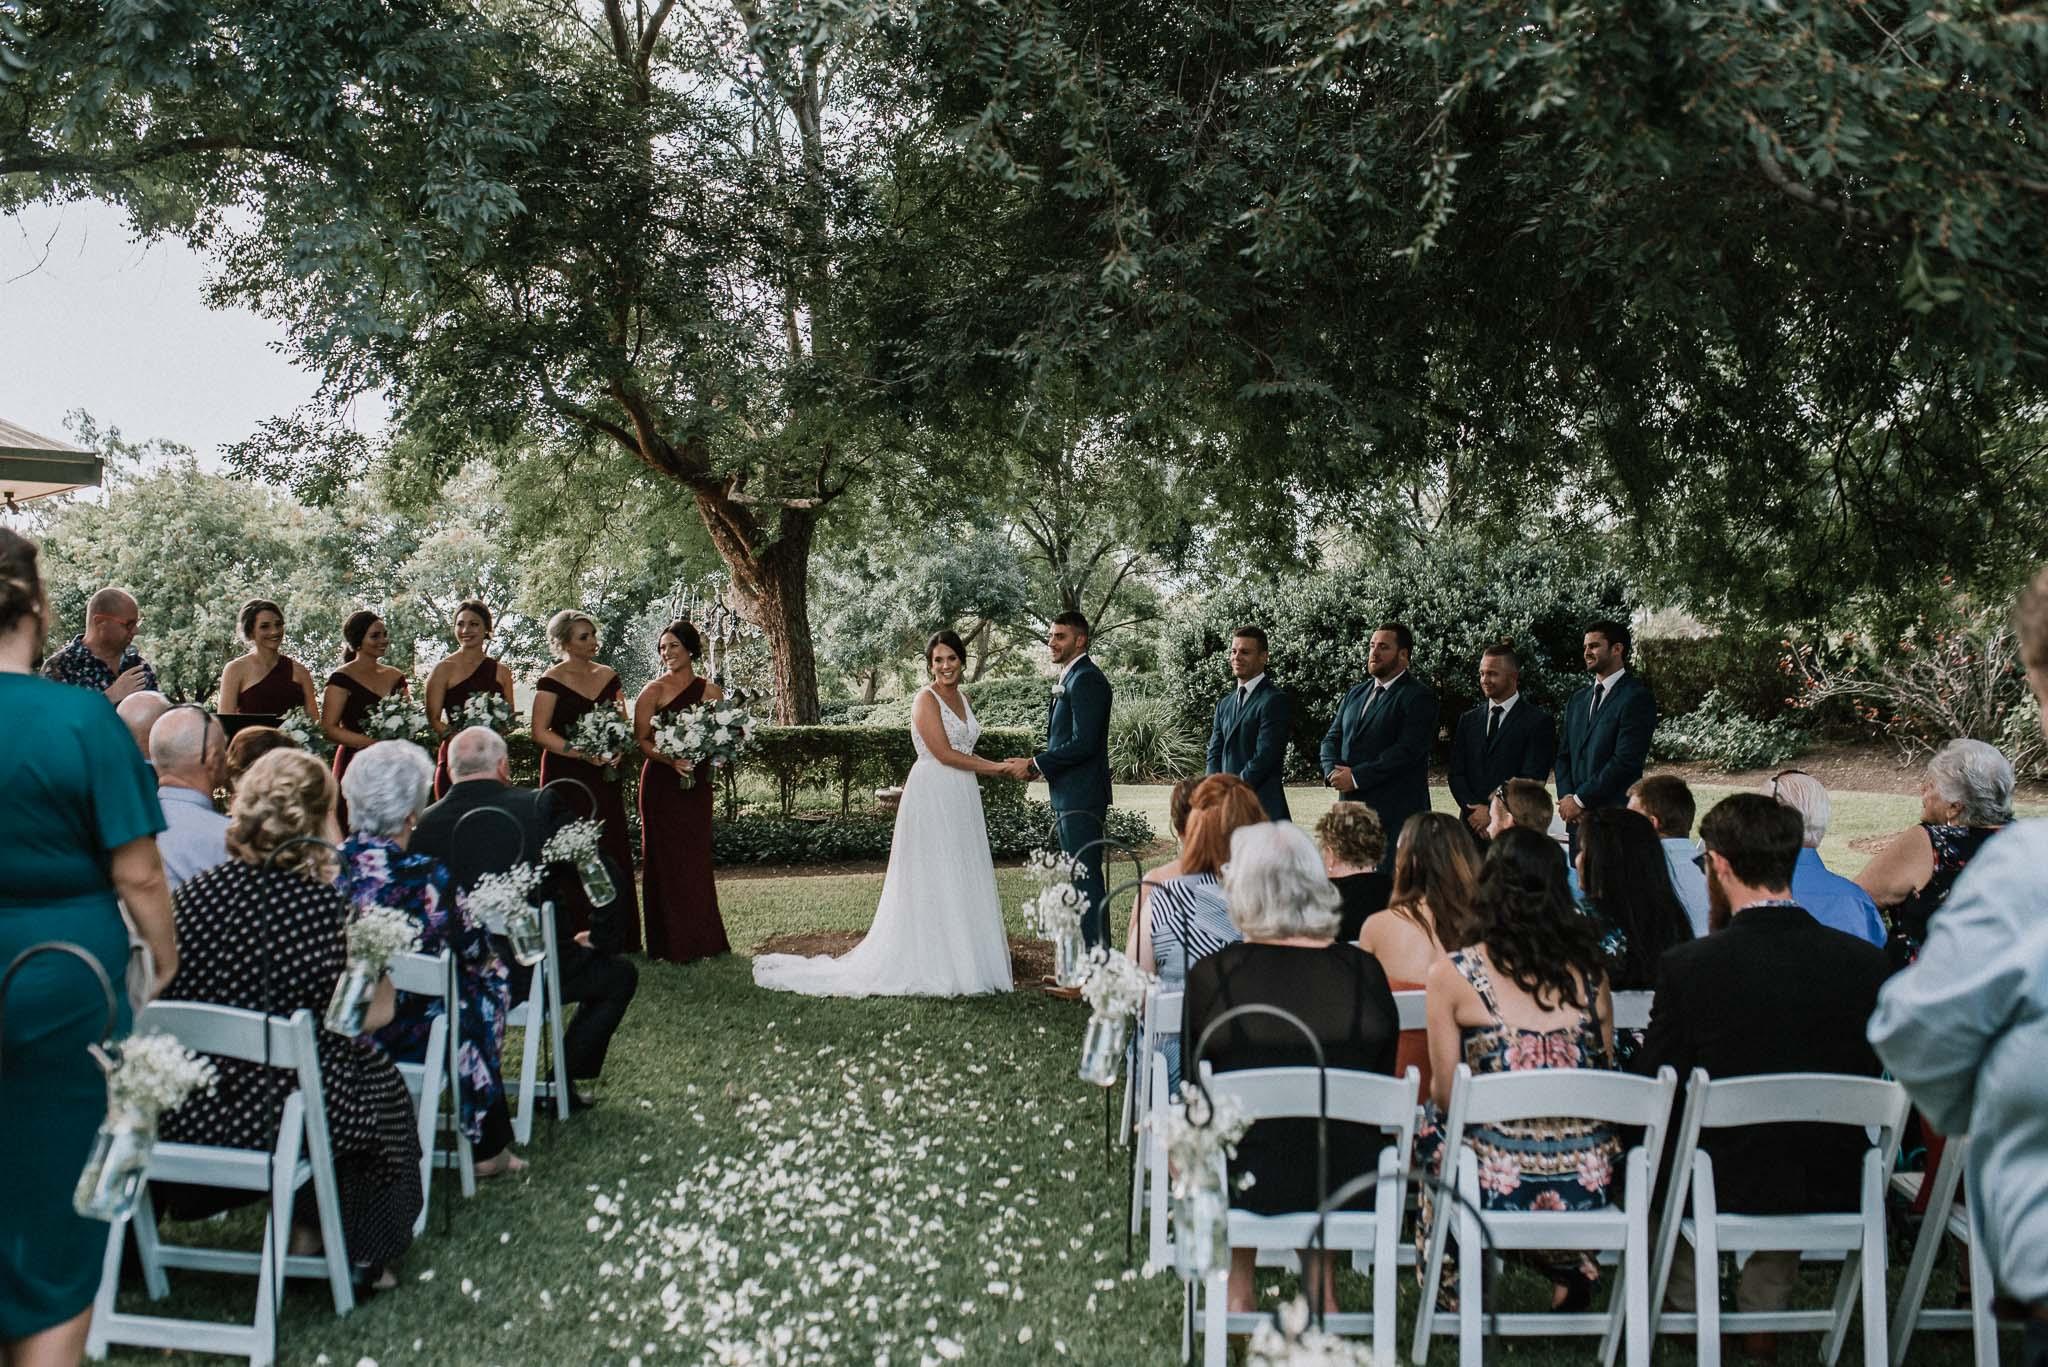 MECURE-RESORT-WEDDING-KING-WEB-48.jpg